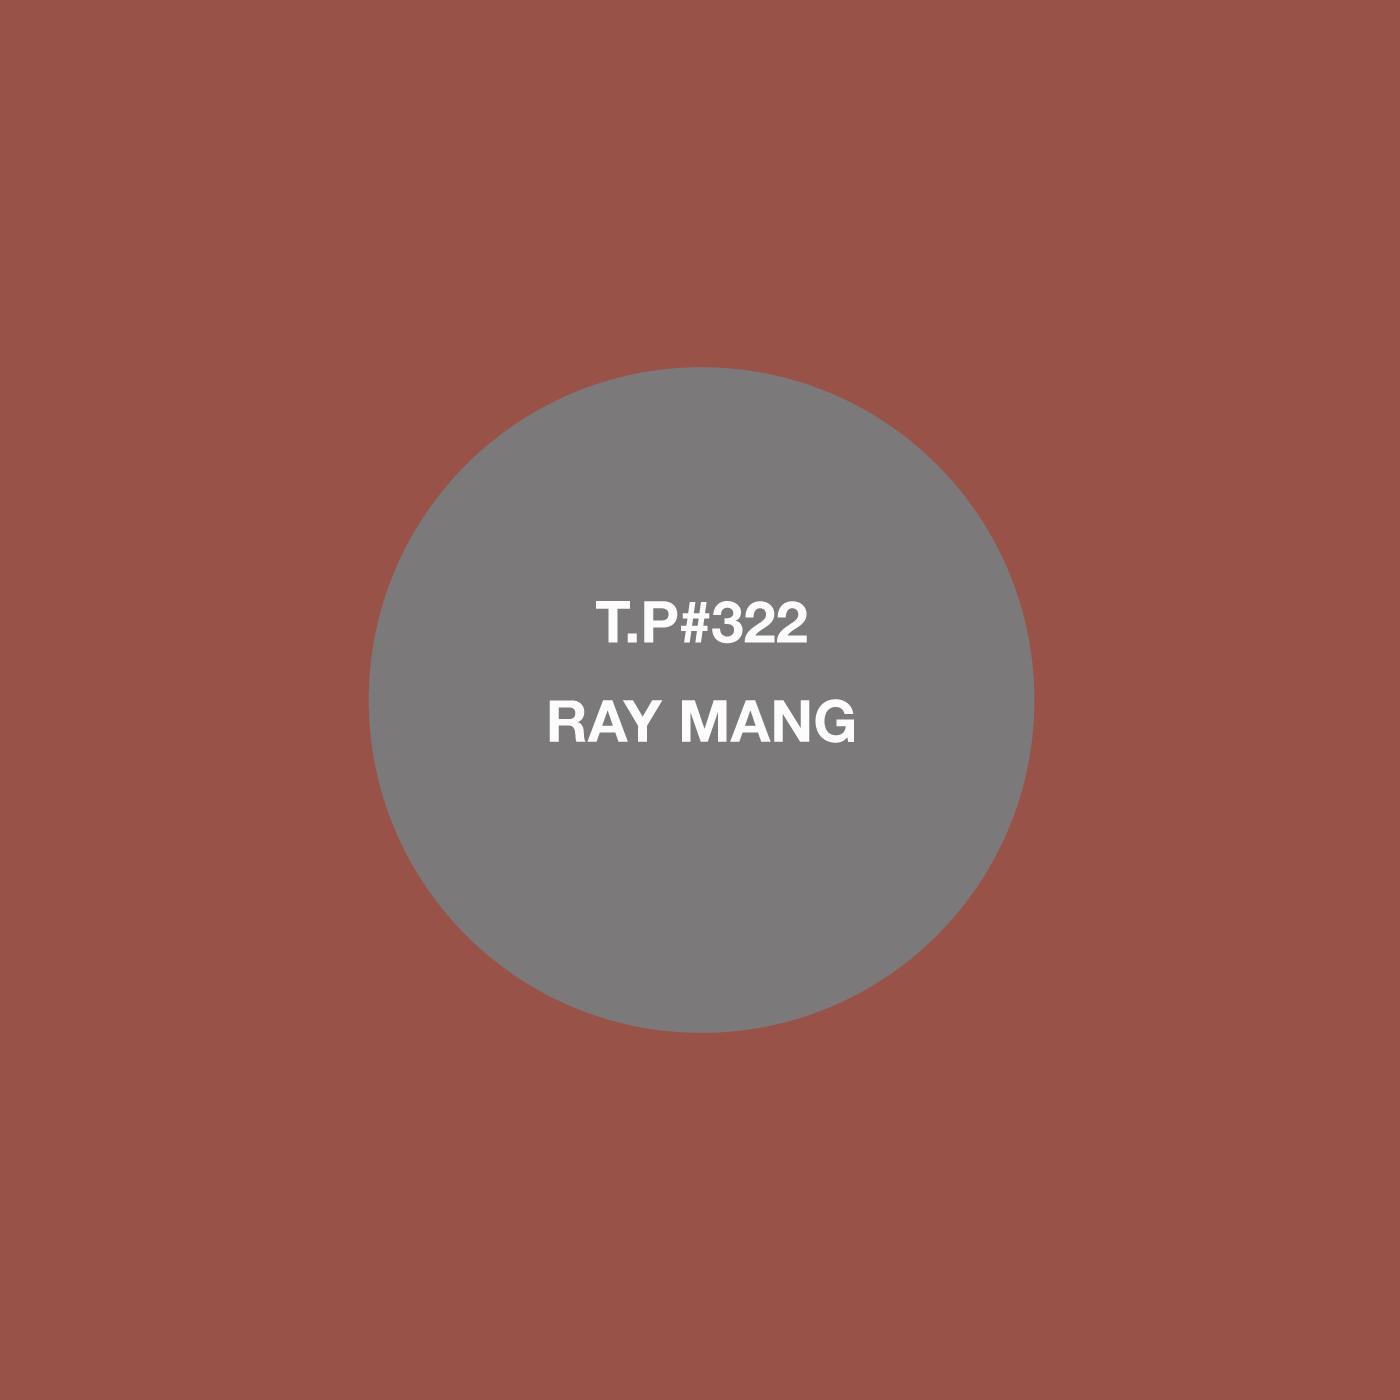 Ray Mang, Raj, Laj, Mix, Test Pressing, Mangled, DJ, Producer